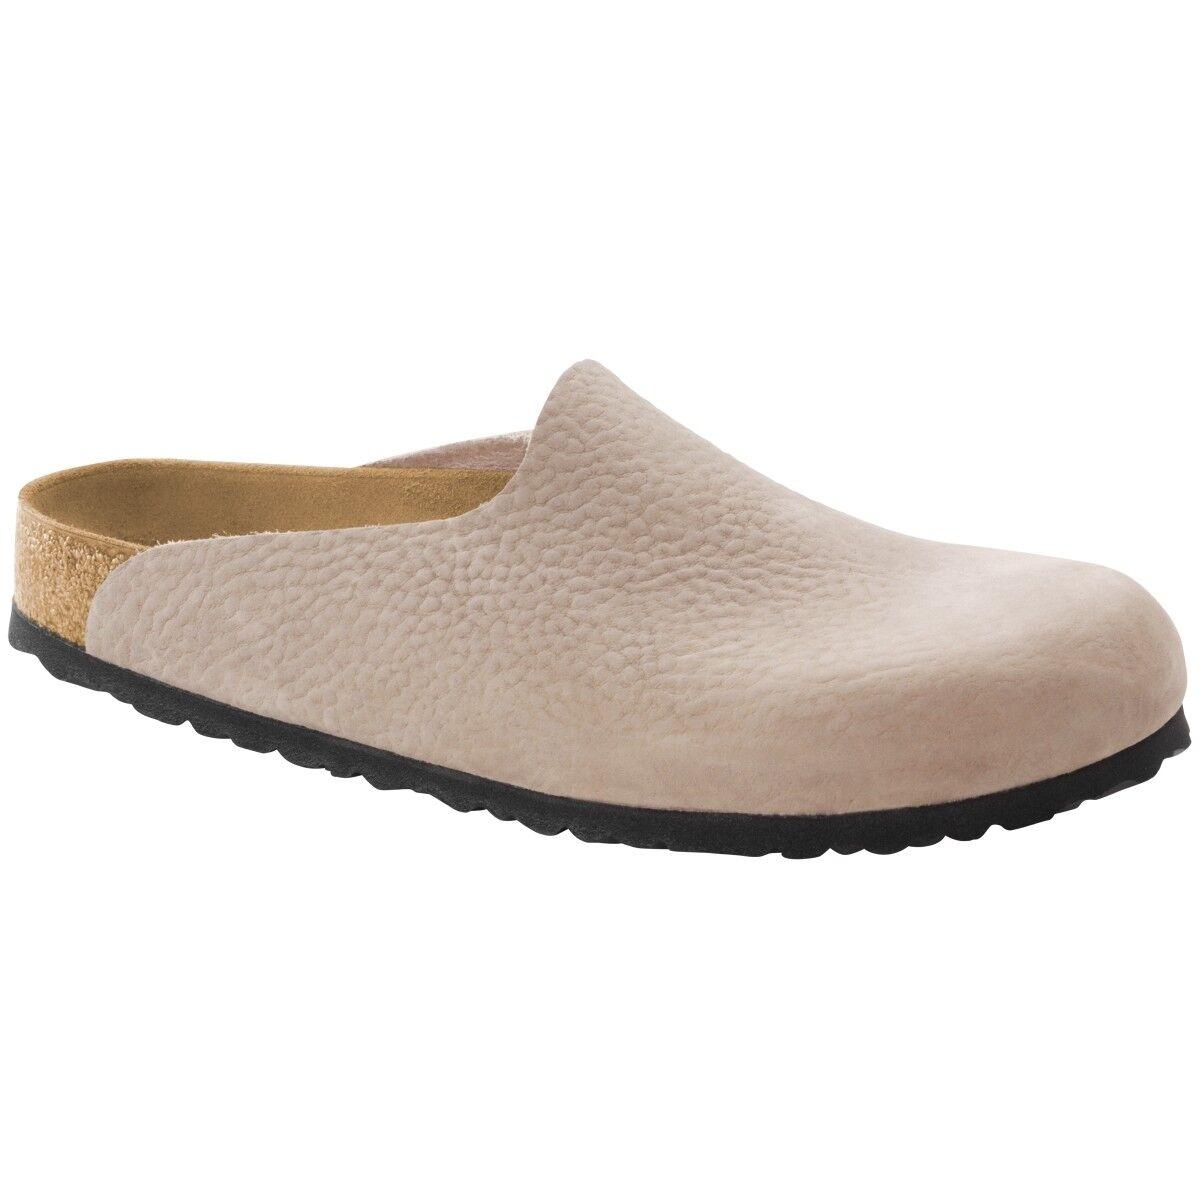 Birkenstock Amsterdam Nubukleder Clogs 1006720 Schuhe Pantolette Weite schmal 1006720 Clogs 19326e